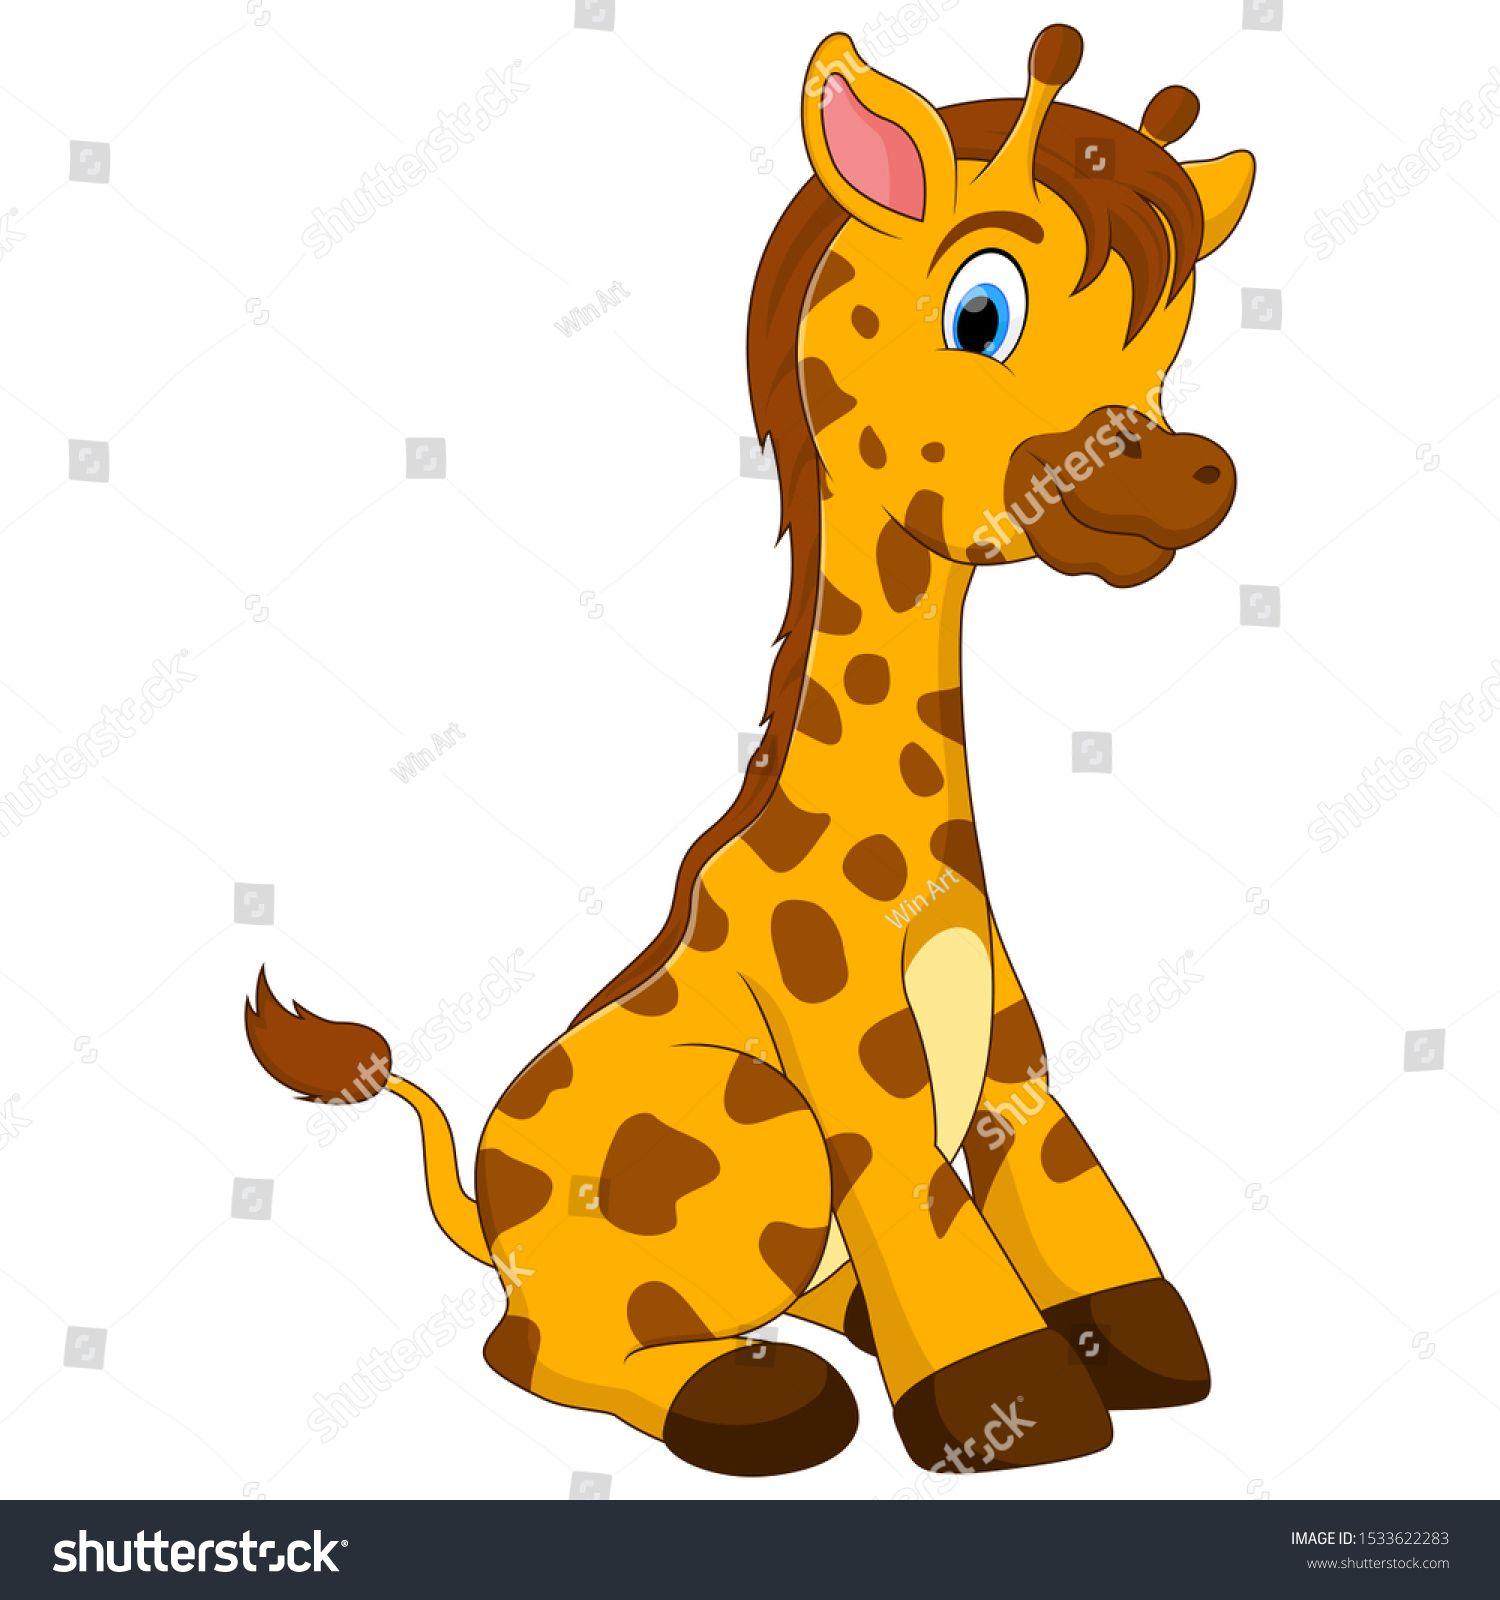 A Baby Giraffe Cartoon Sitting On The Floor Ad Sponsored Giraffe Baby Cartoon Floor In 2020 Baby Giraffe Baby Cartoon Cartoon